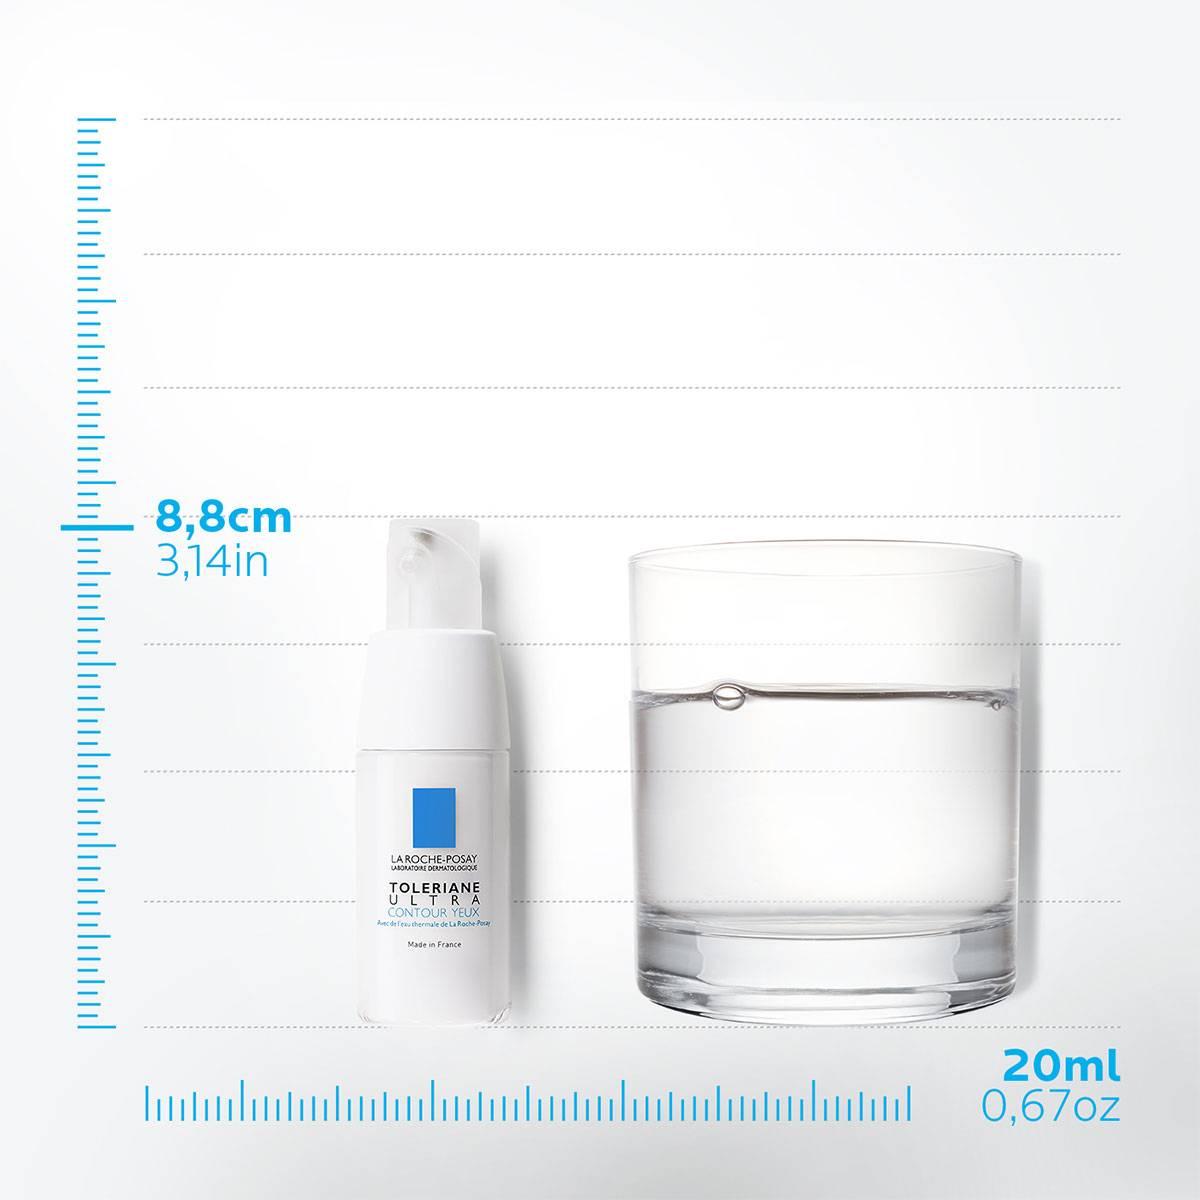 La Roche Posay Produktsida Toleriane Ultra Eye Contour 20ml 3337872419